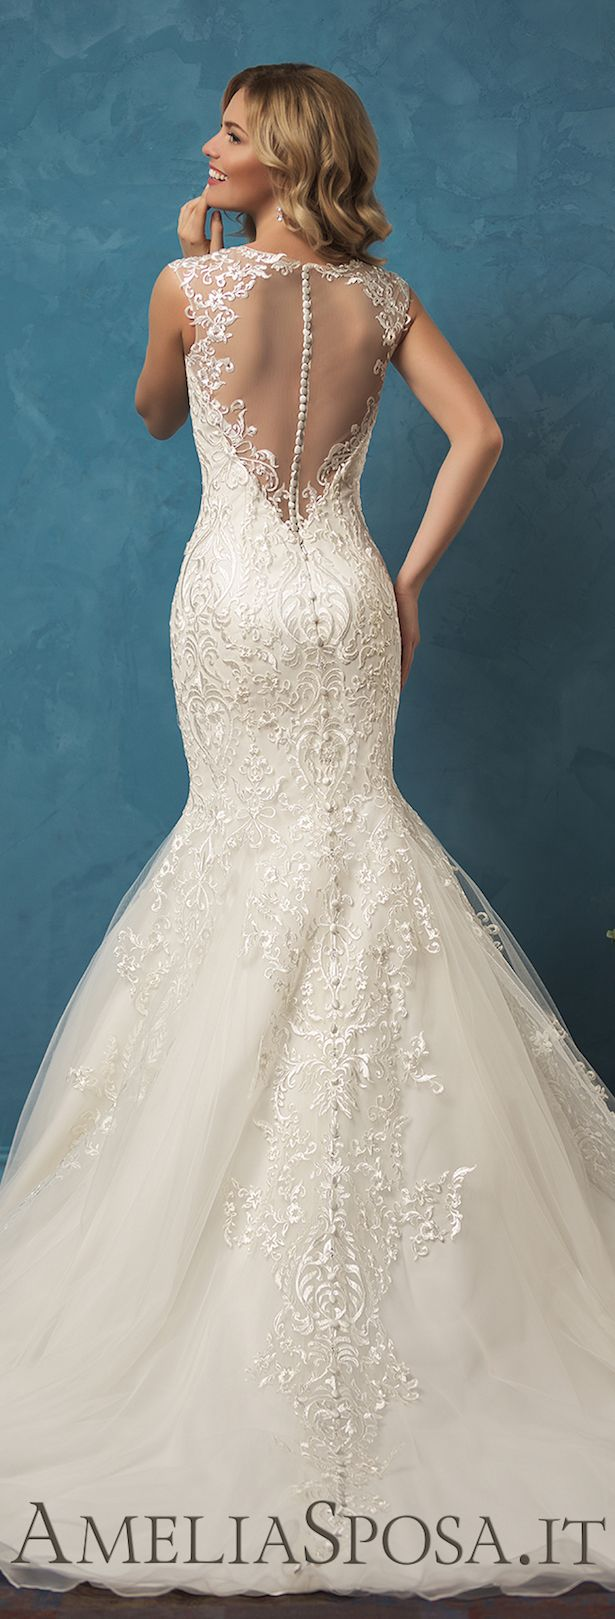 Amelia Sposa 2017 Wedding Dress | Belle the Magazine . The Wedding Blog For The Sophisticated Bride | Bloglovin'